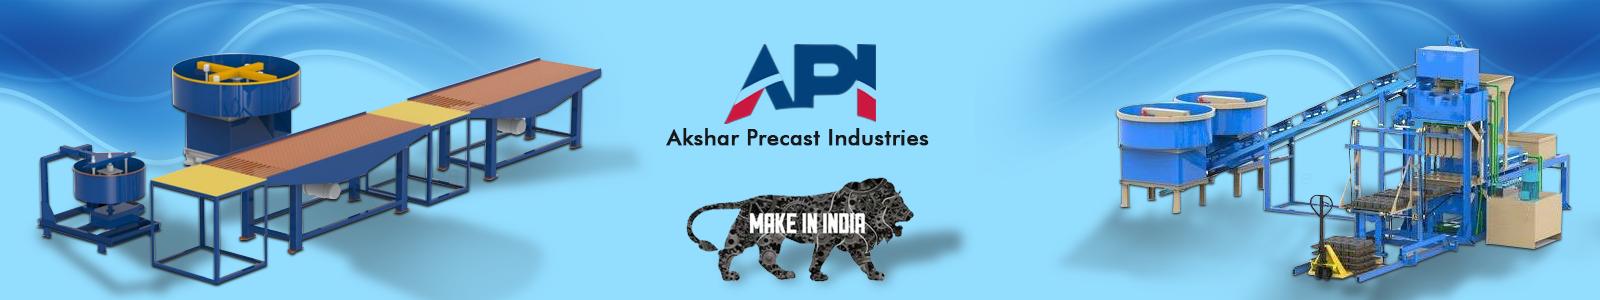 Akshar Precast Industries